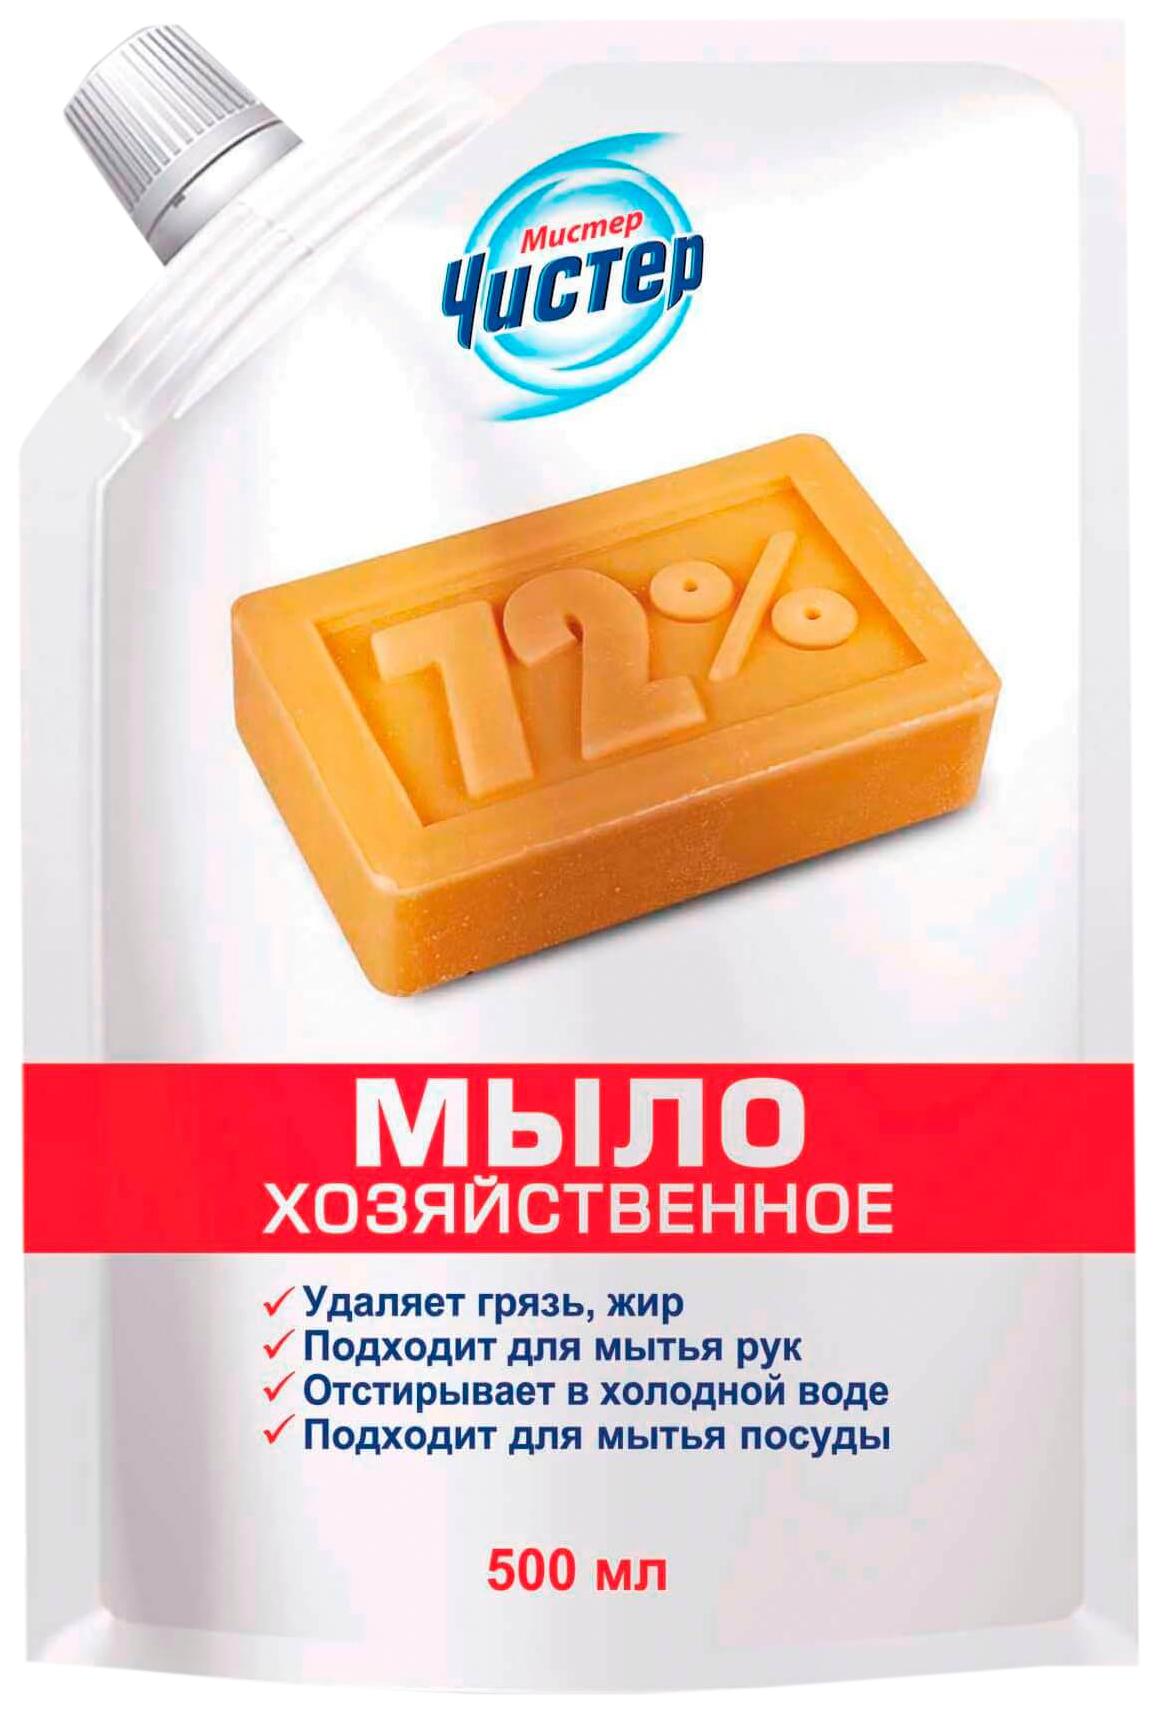 Мыло Мистер Чистер жидкое хозяйственное 500 мл